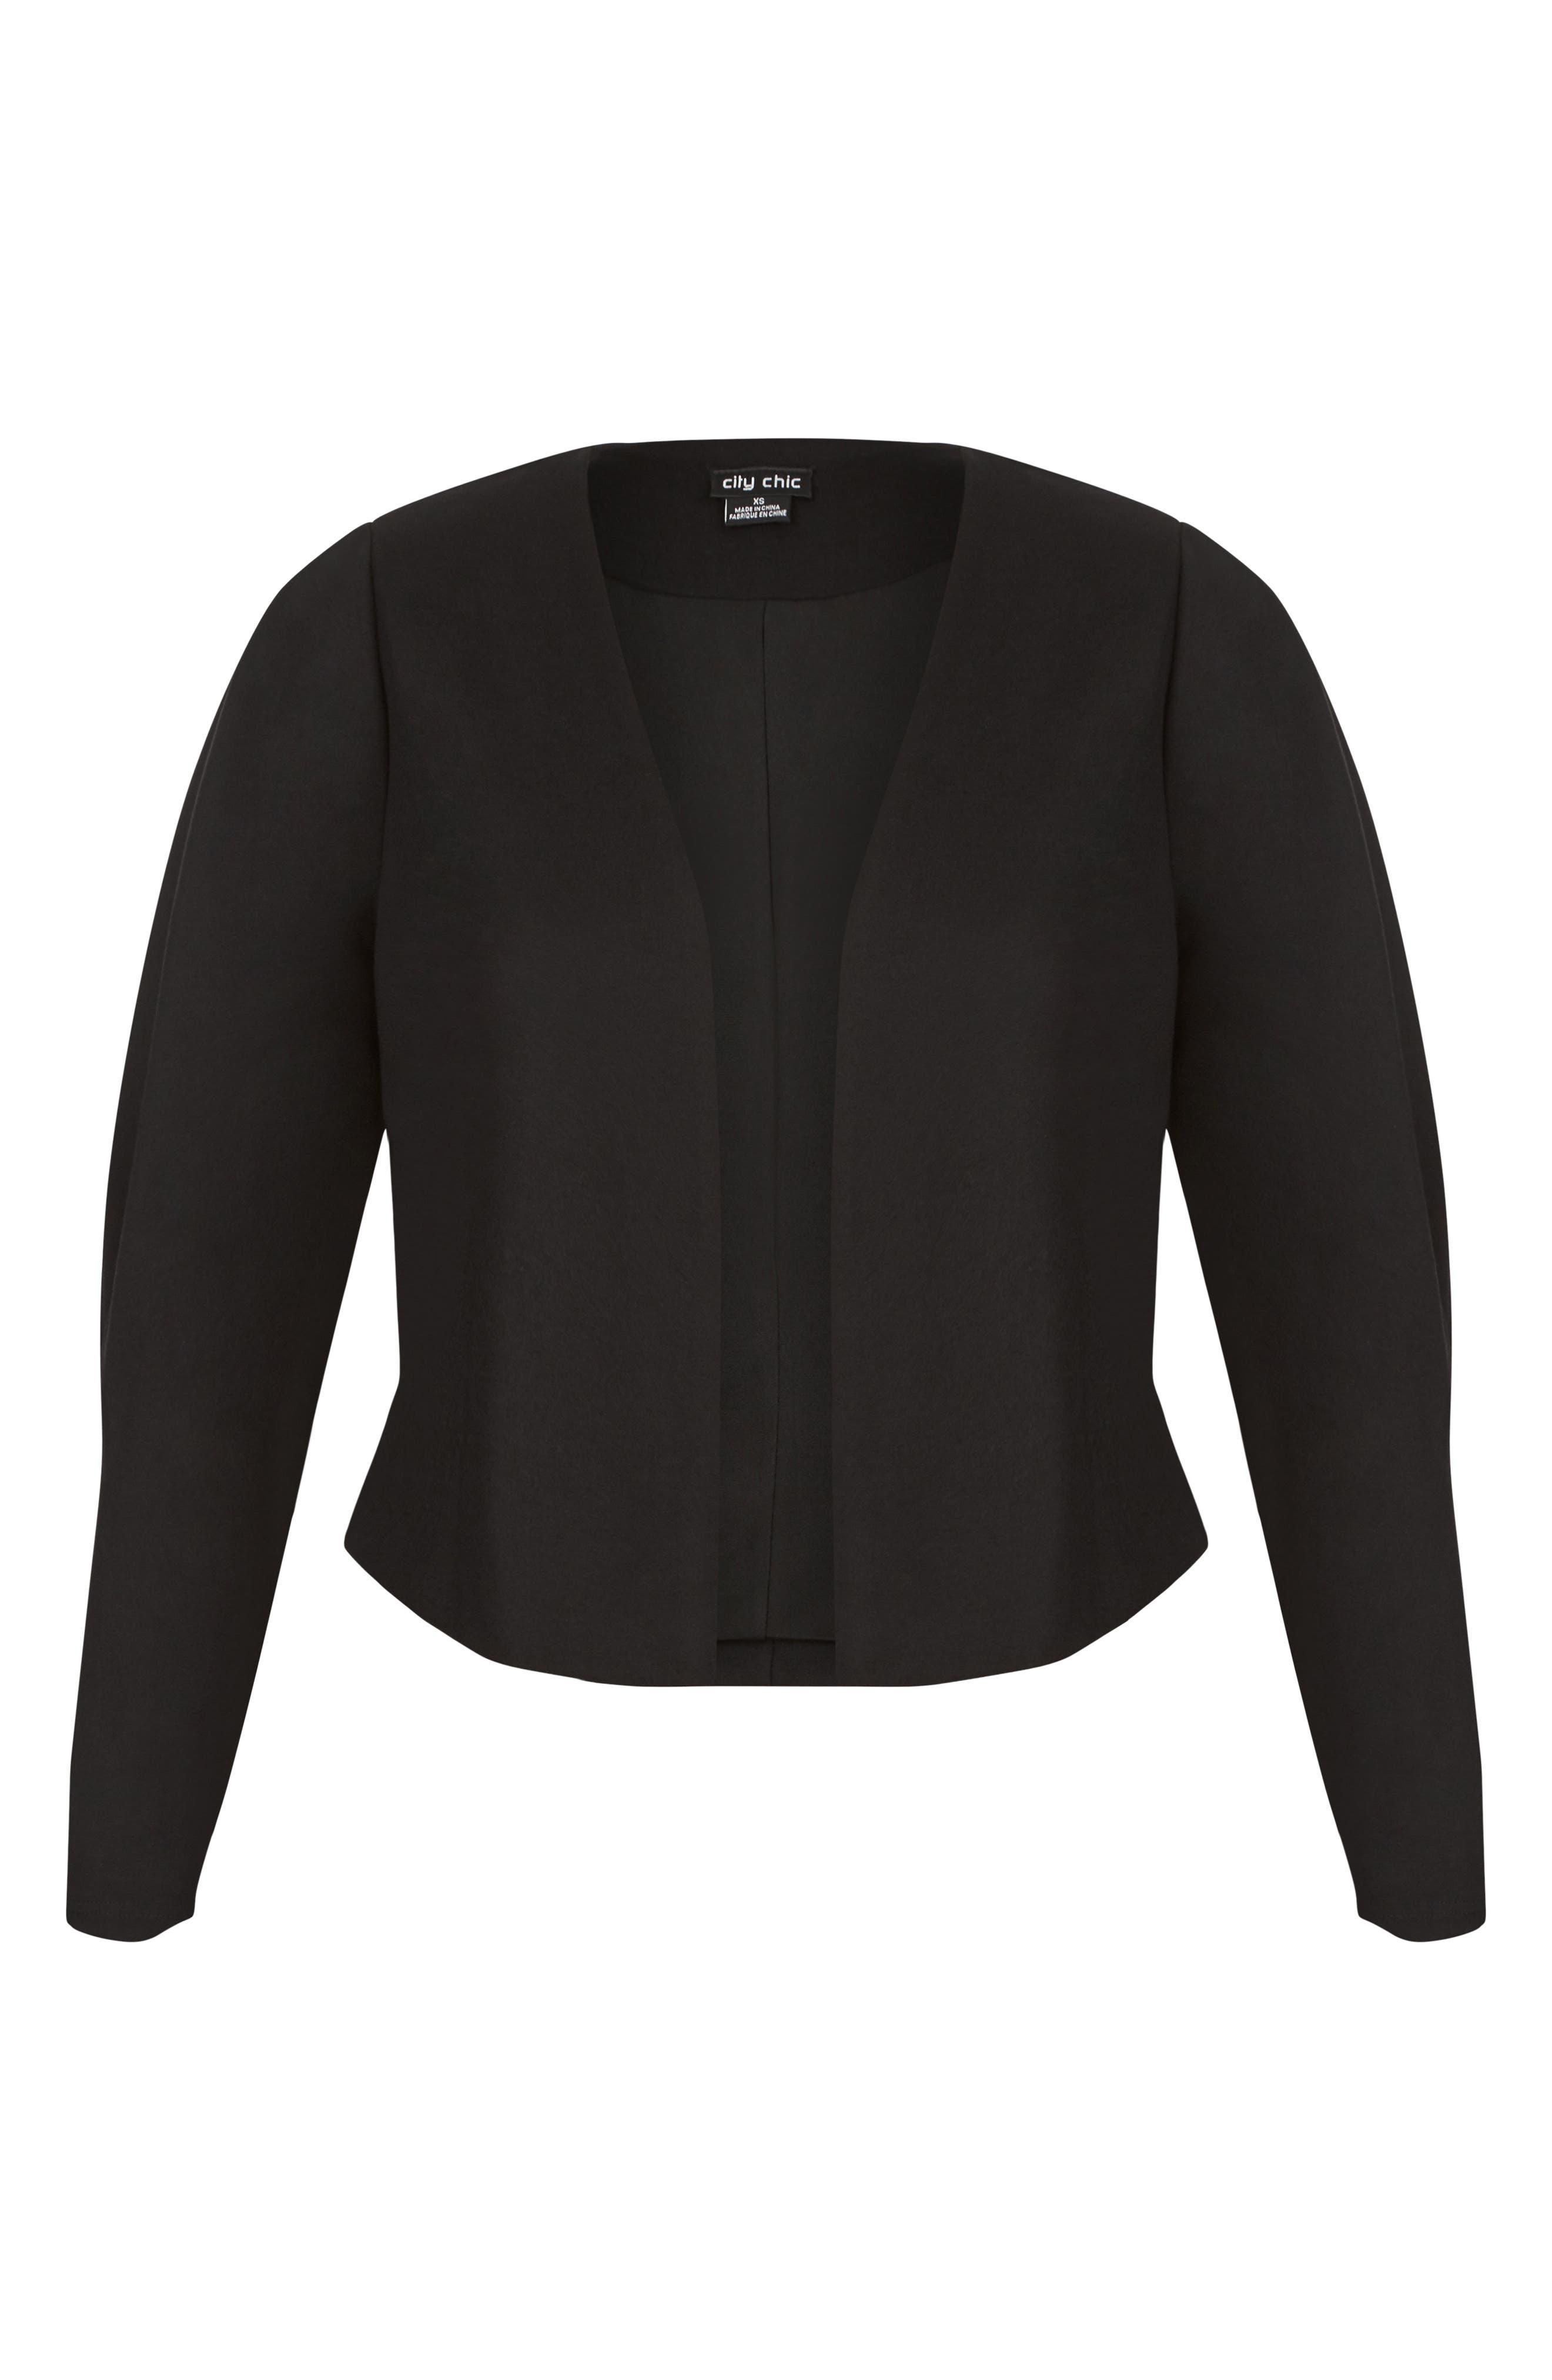 Office Fling Jacket,                             Alternate thumbnail 3, color,                             BLACK